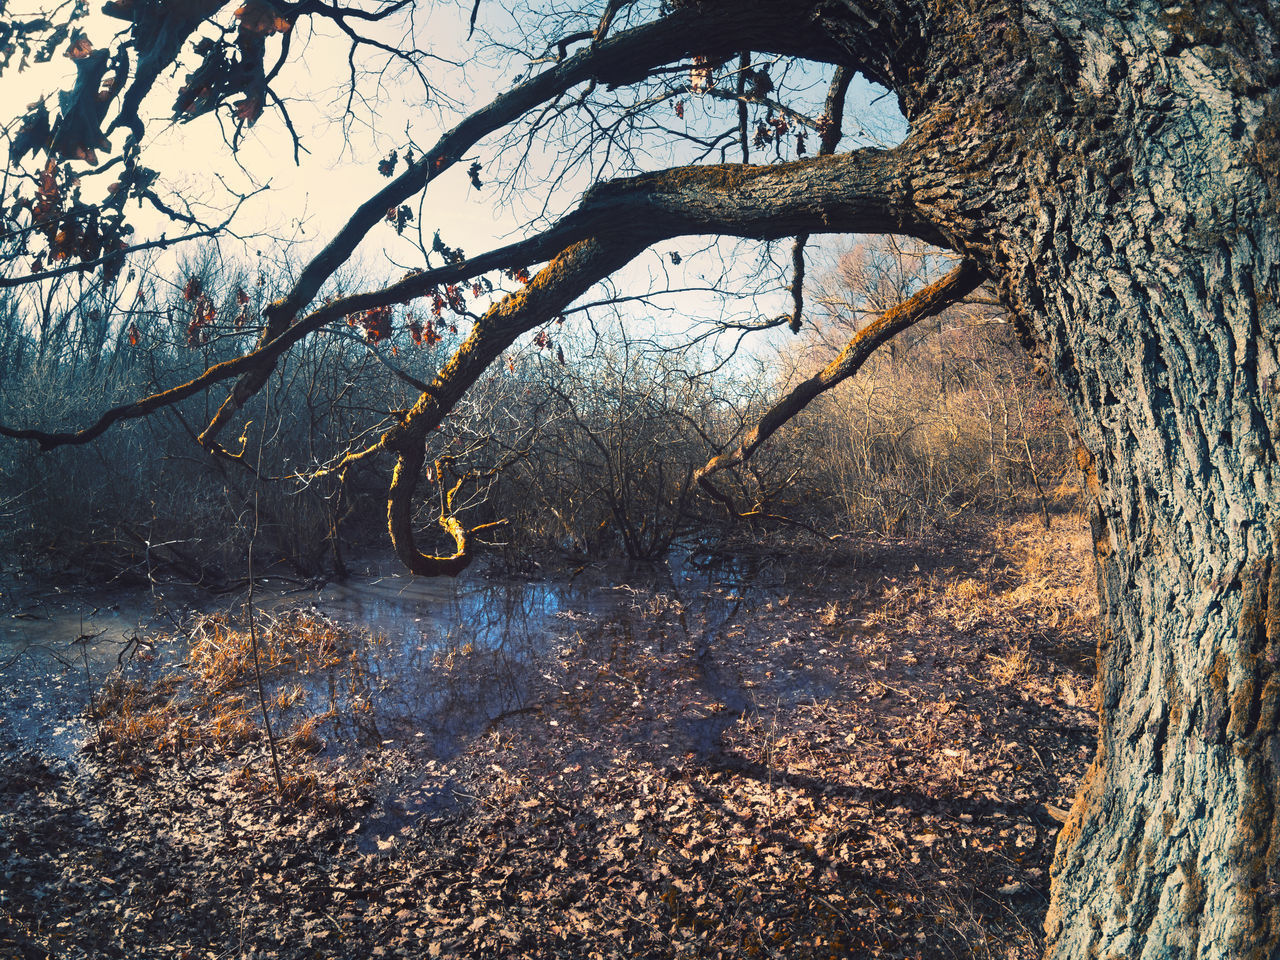 BARE TREE BY LAKE